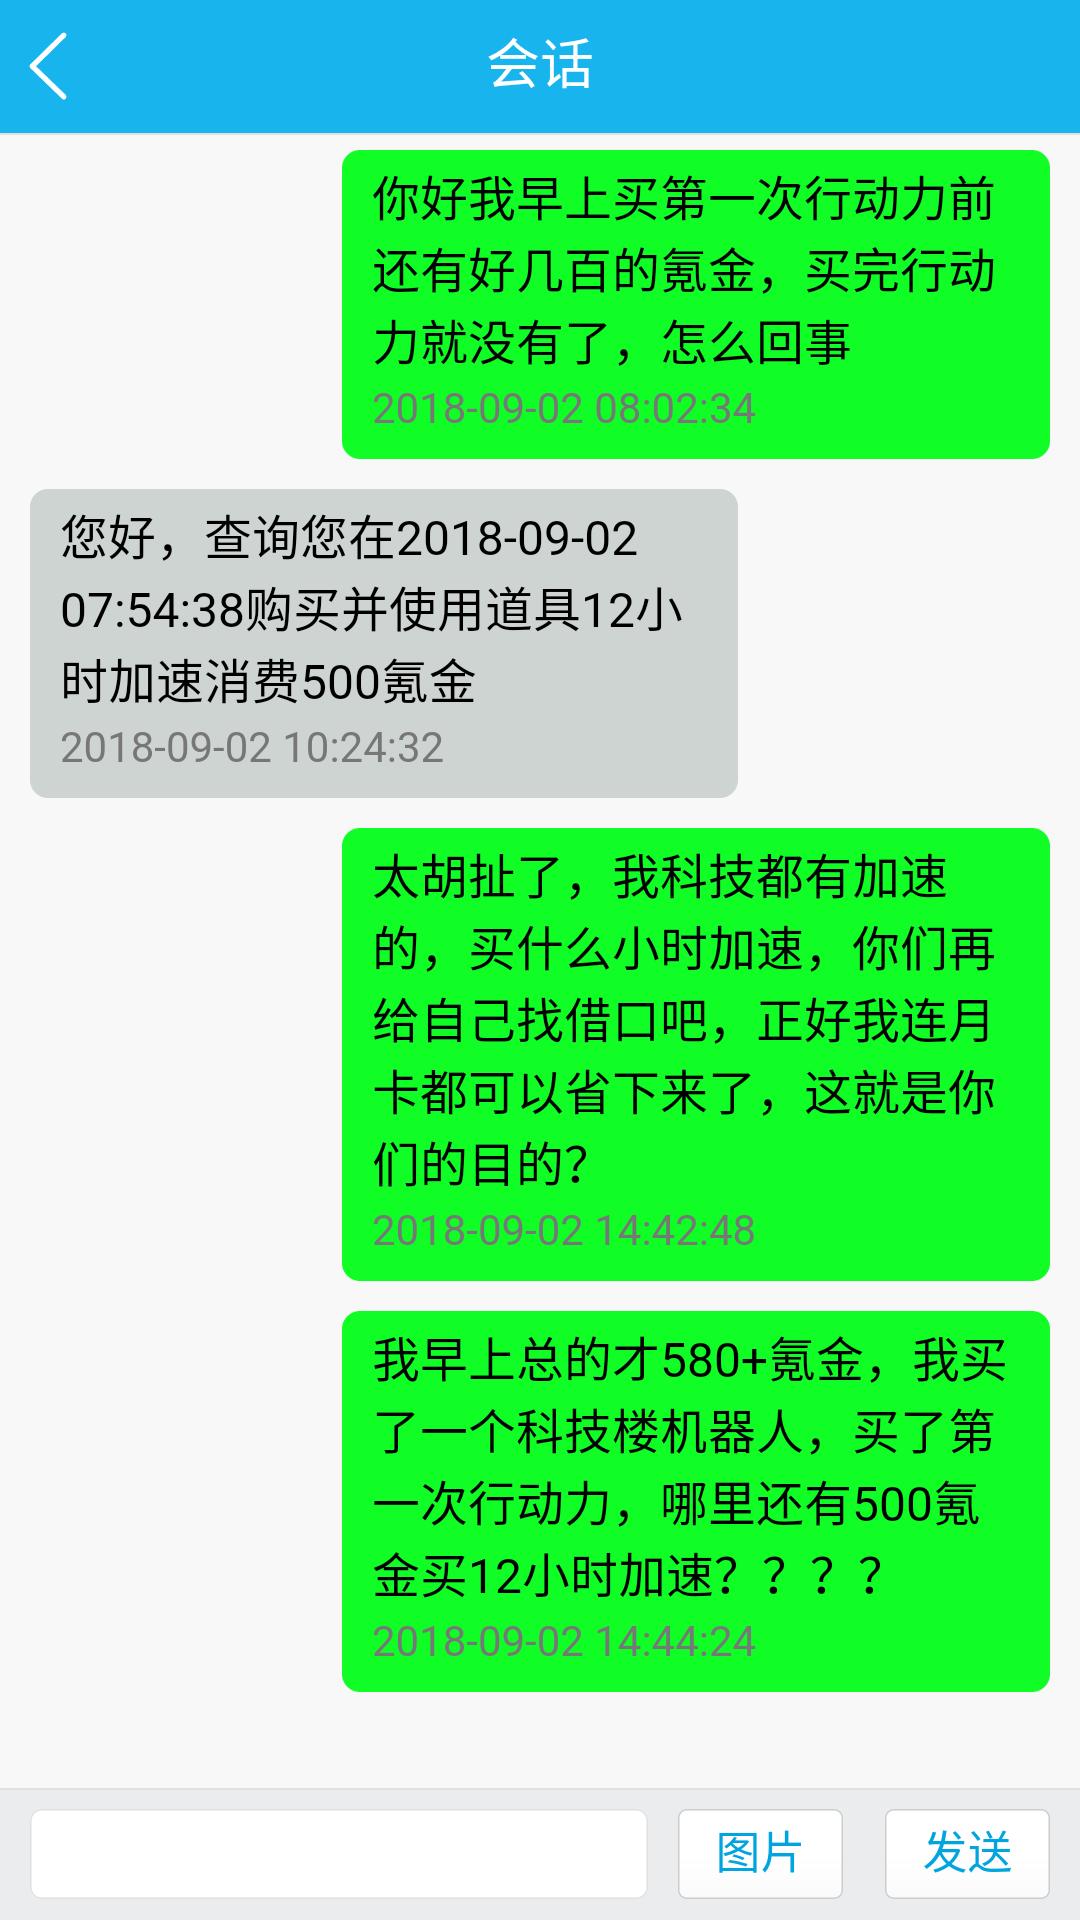 Screenshot_2018-09-02-14-44-45.png